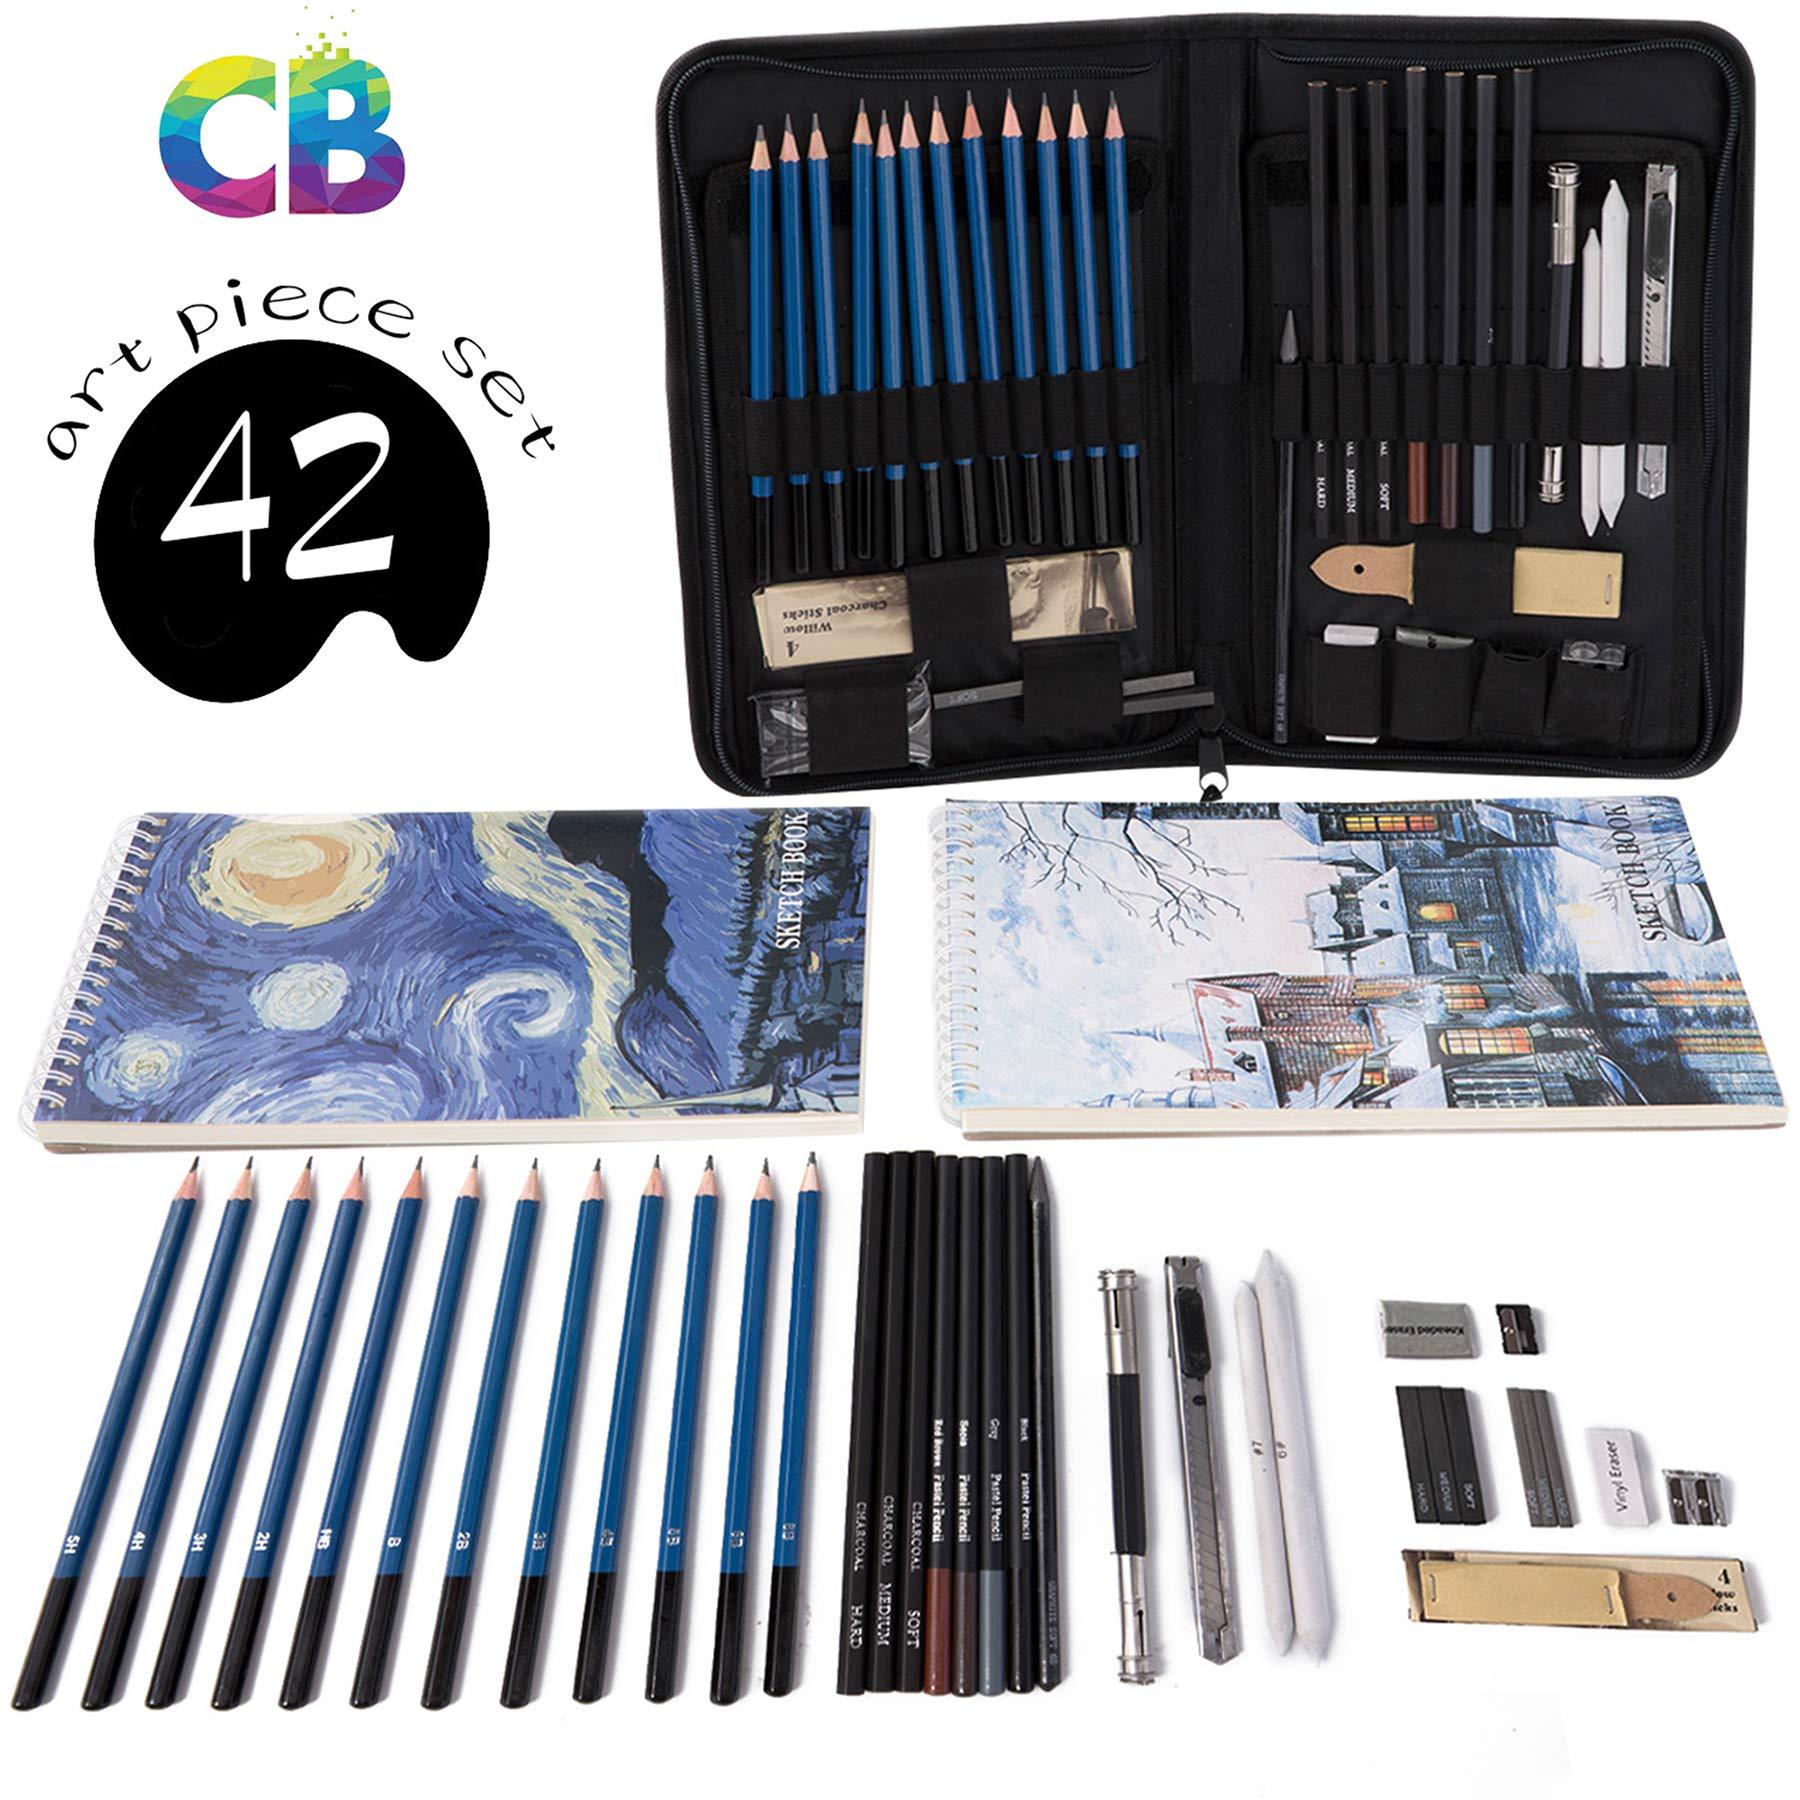 Professional Art Set Drawing and Sketching Set- Drawing, Sketching and Charcoal Pencils (42pcs)